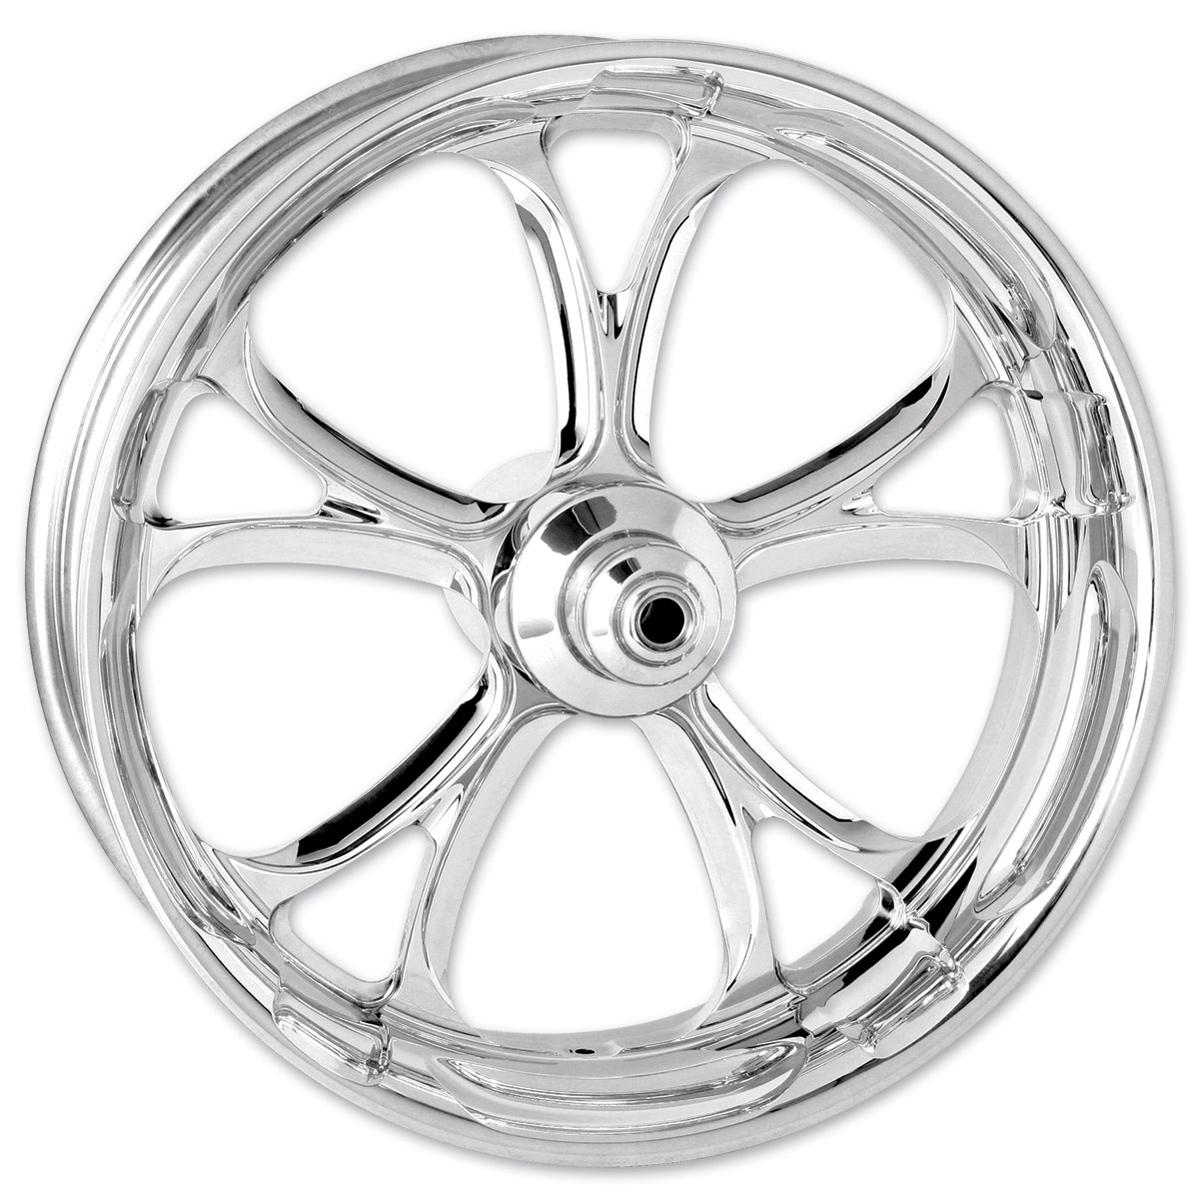 Performance Machine Luxe Chrome Front Wheel 21x3.5 Non-ABS